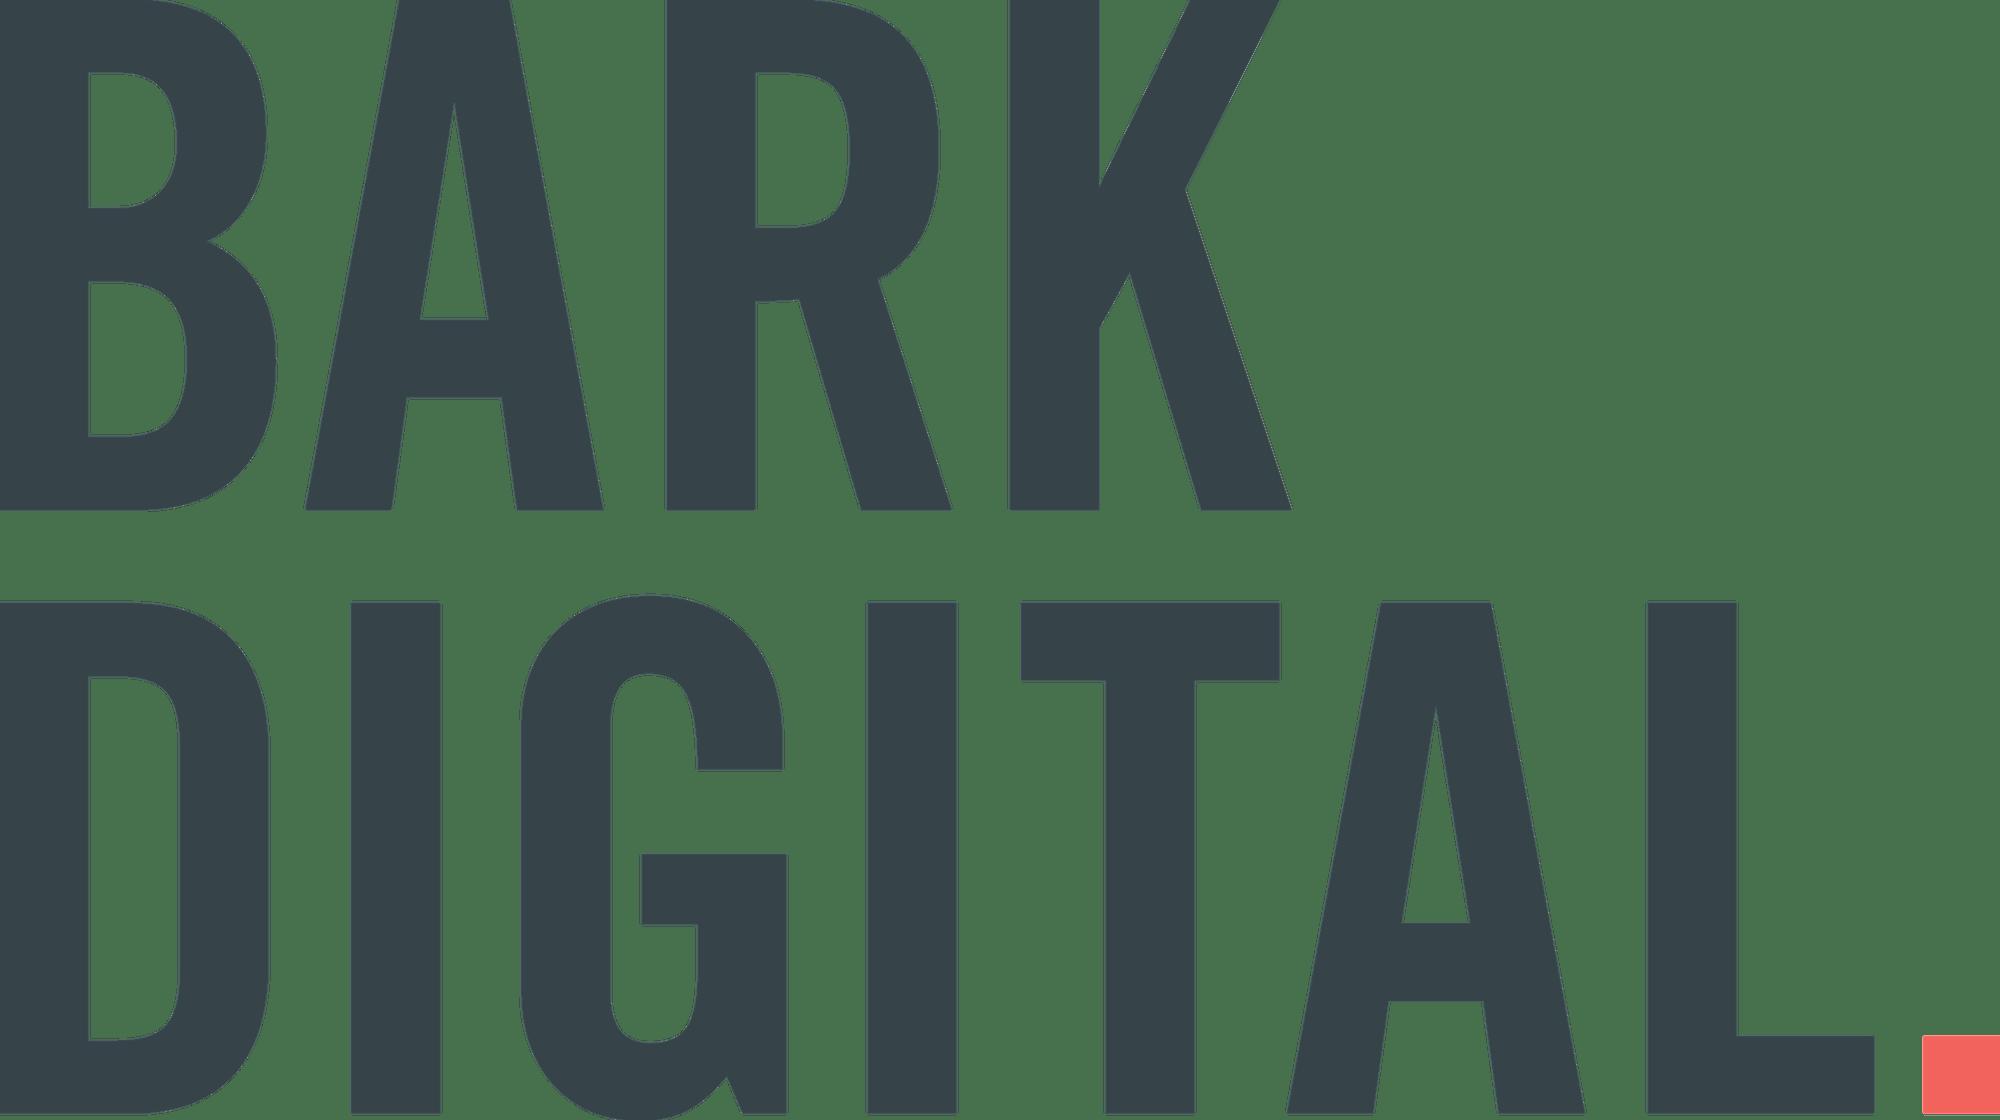 Bark Digital